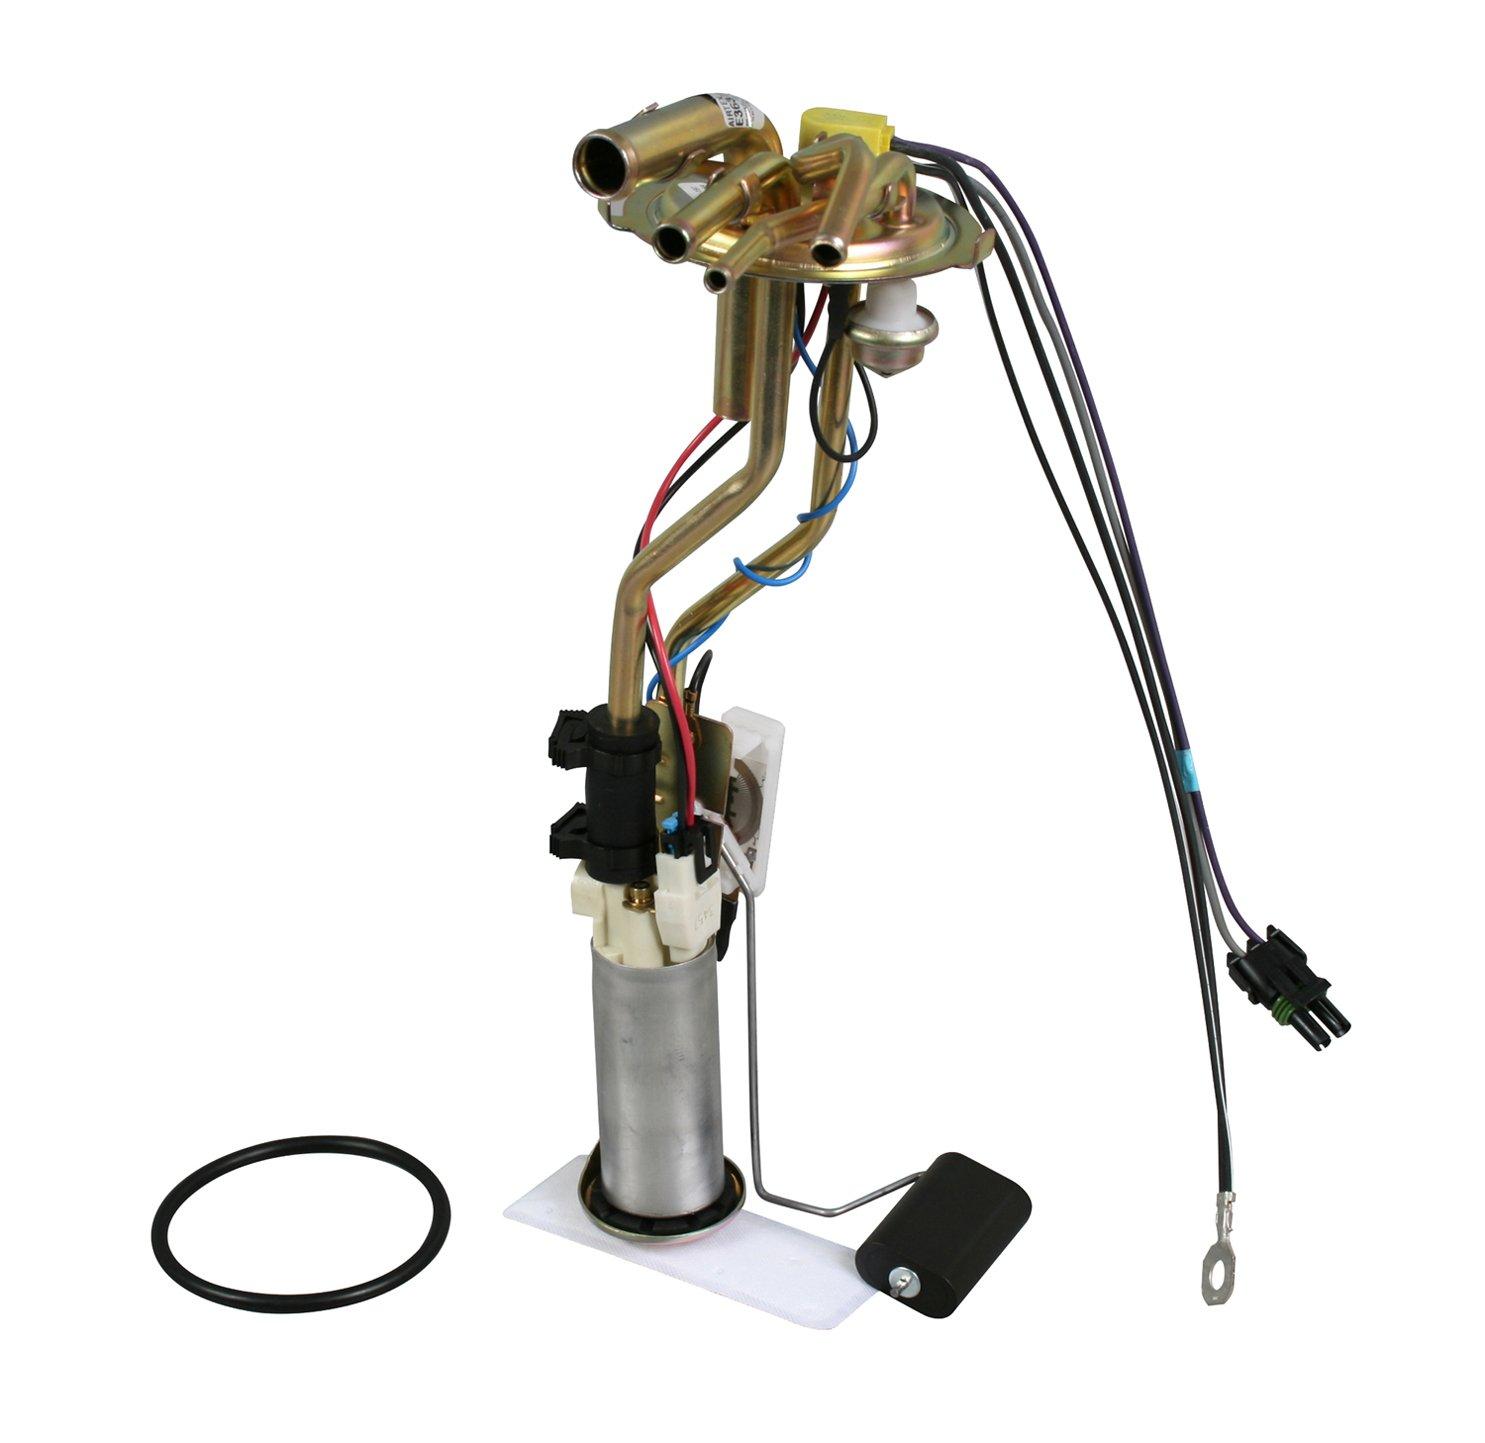 Airtex E3637s Fuel Pump Sender Assembly Automotive Pontiac Fiero Filter Location